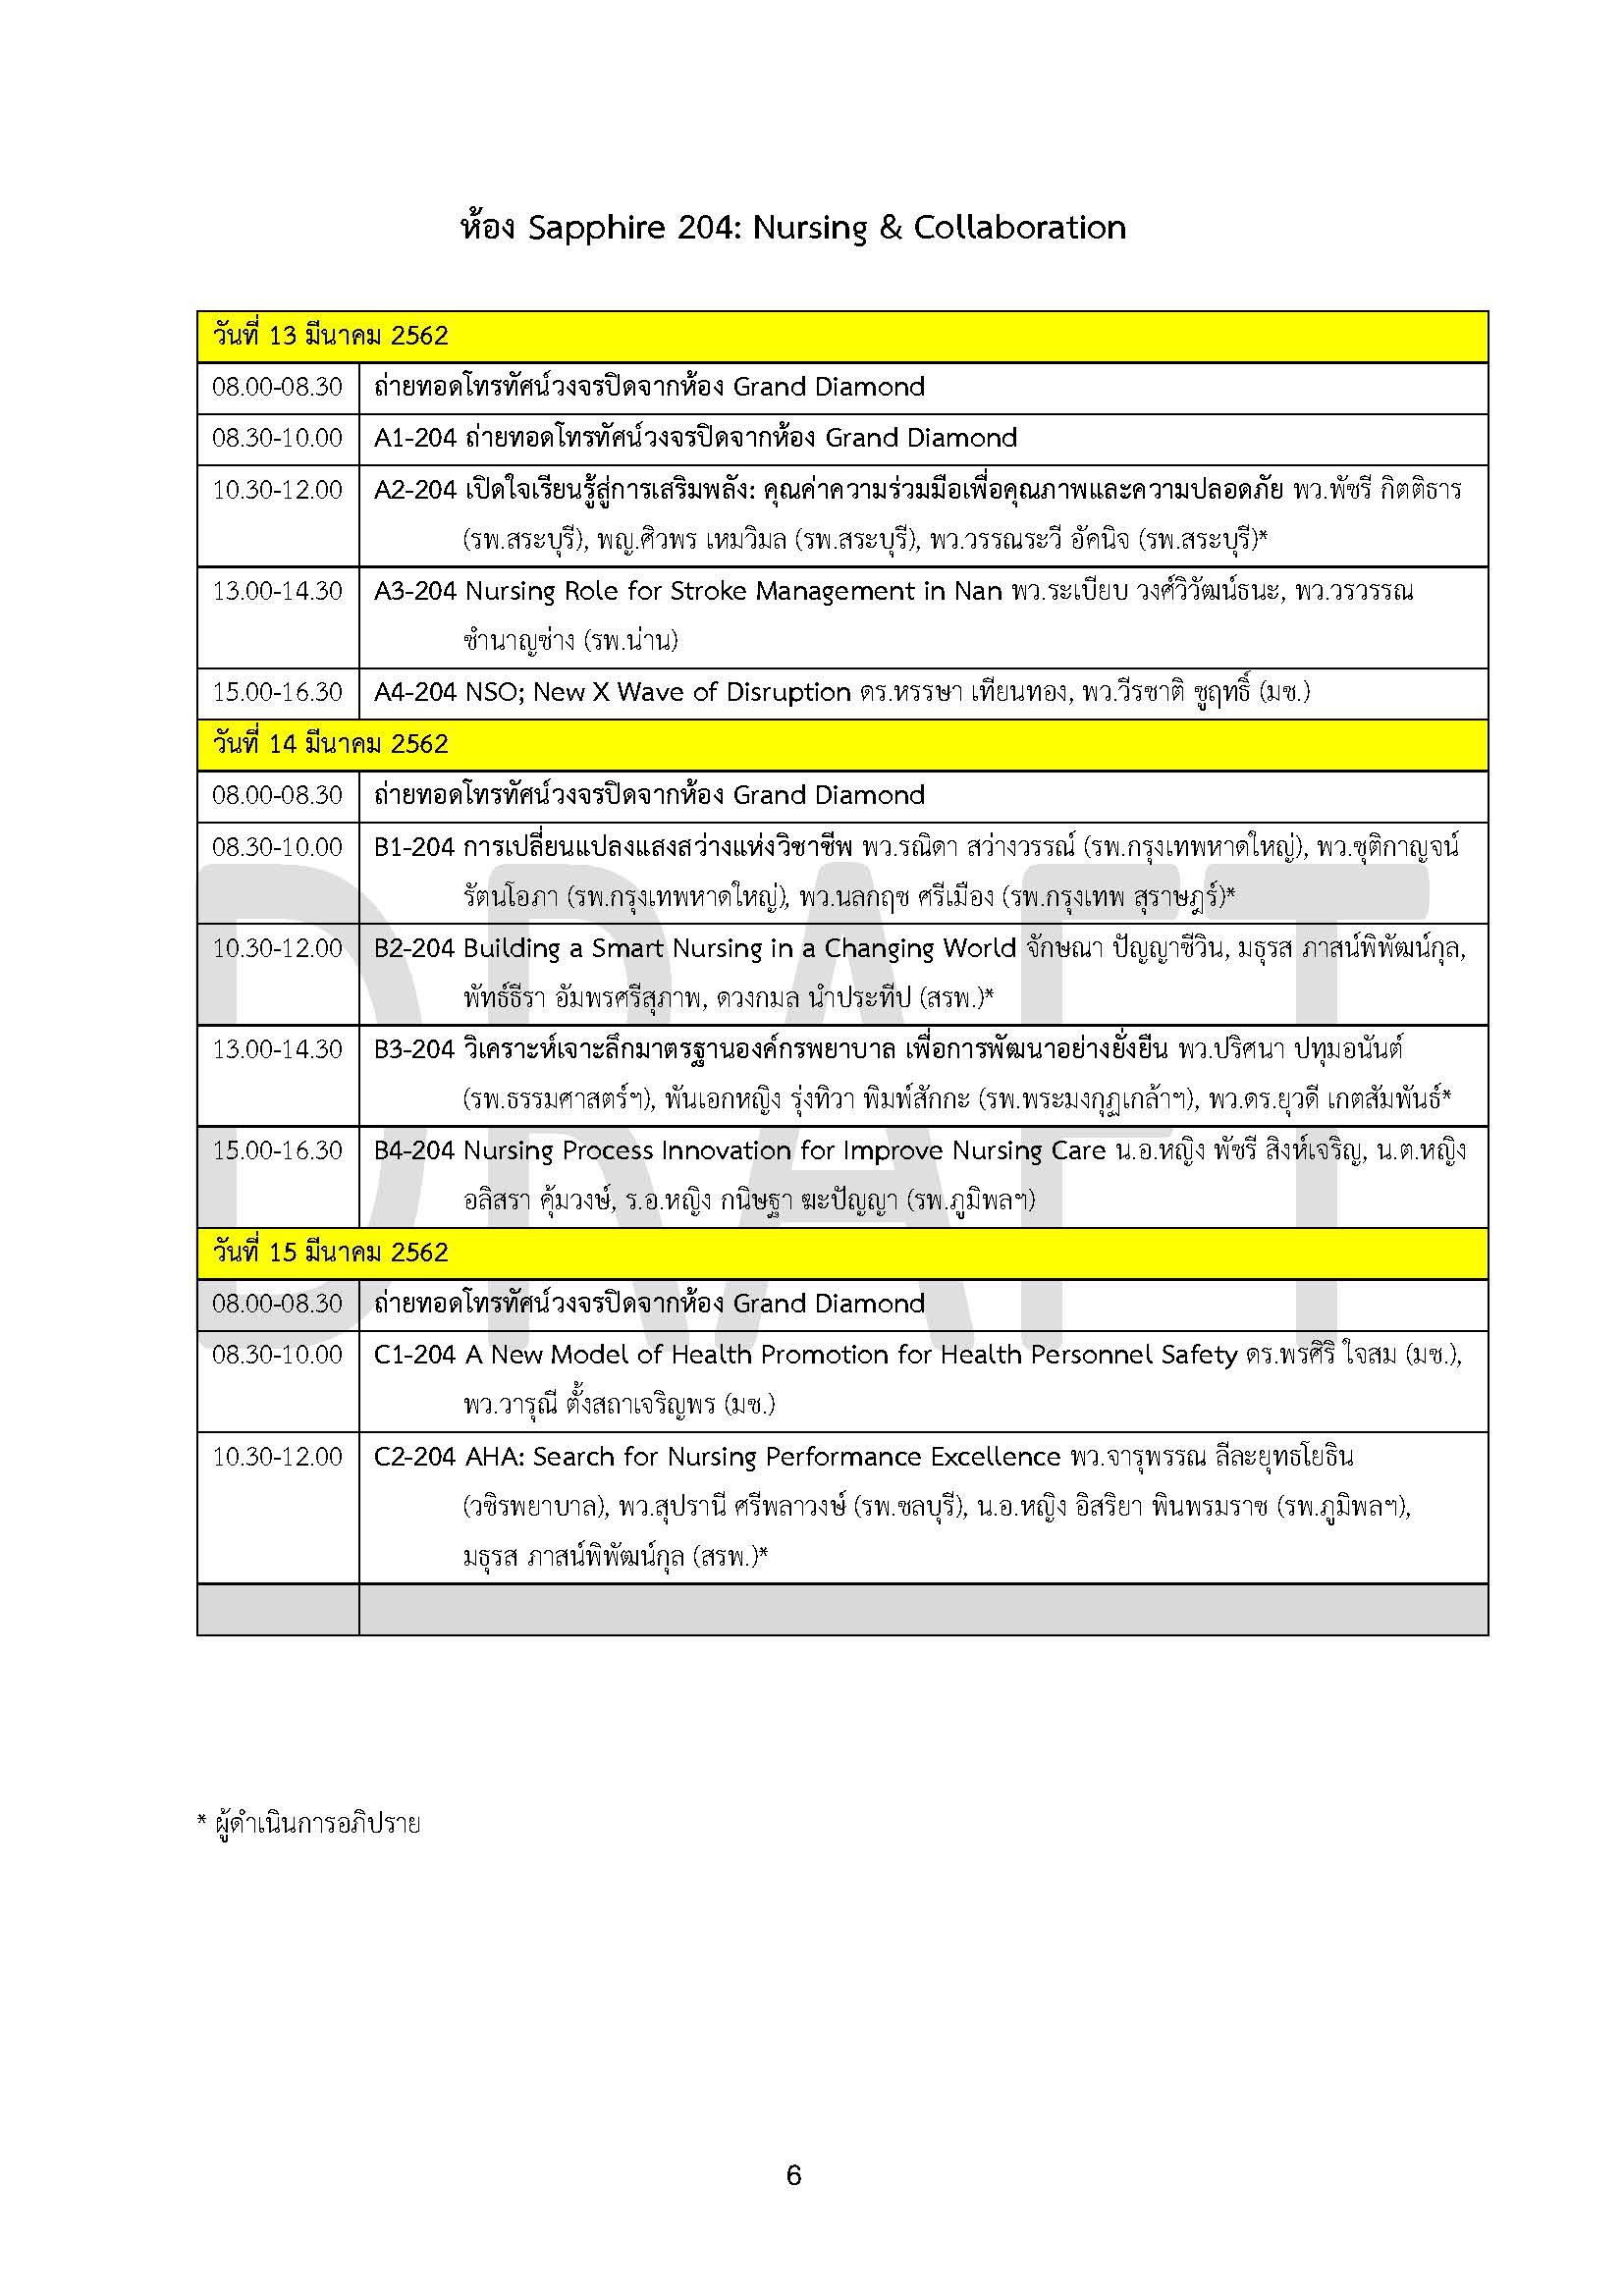 info_agenda_06